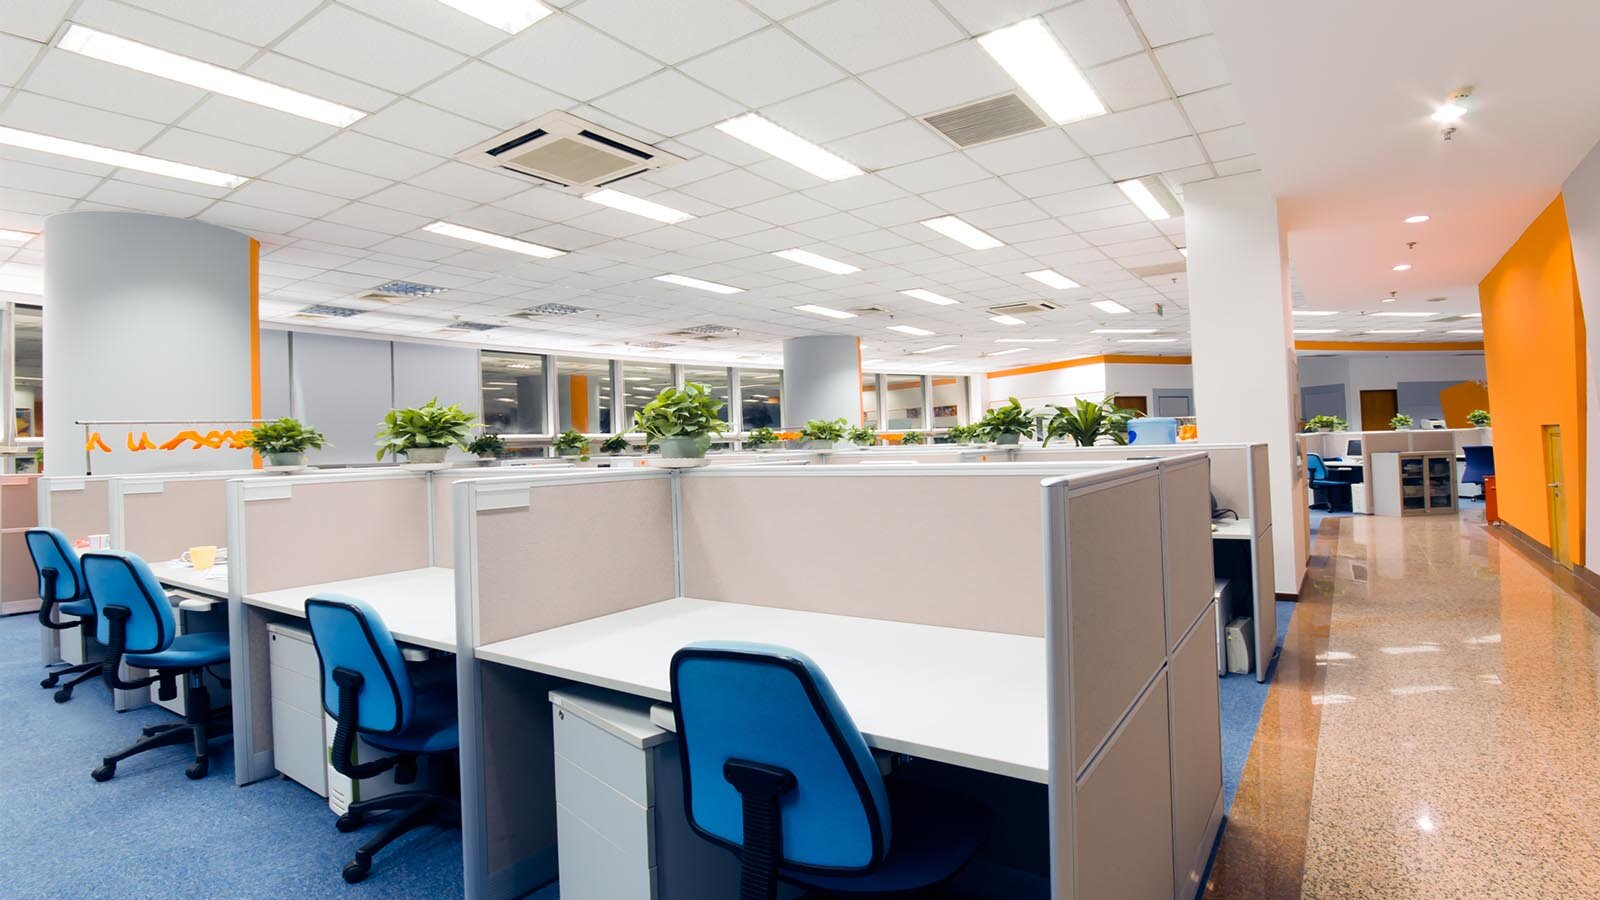 ketch industries led lighting